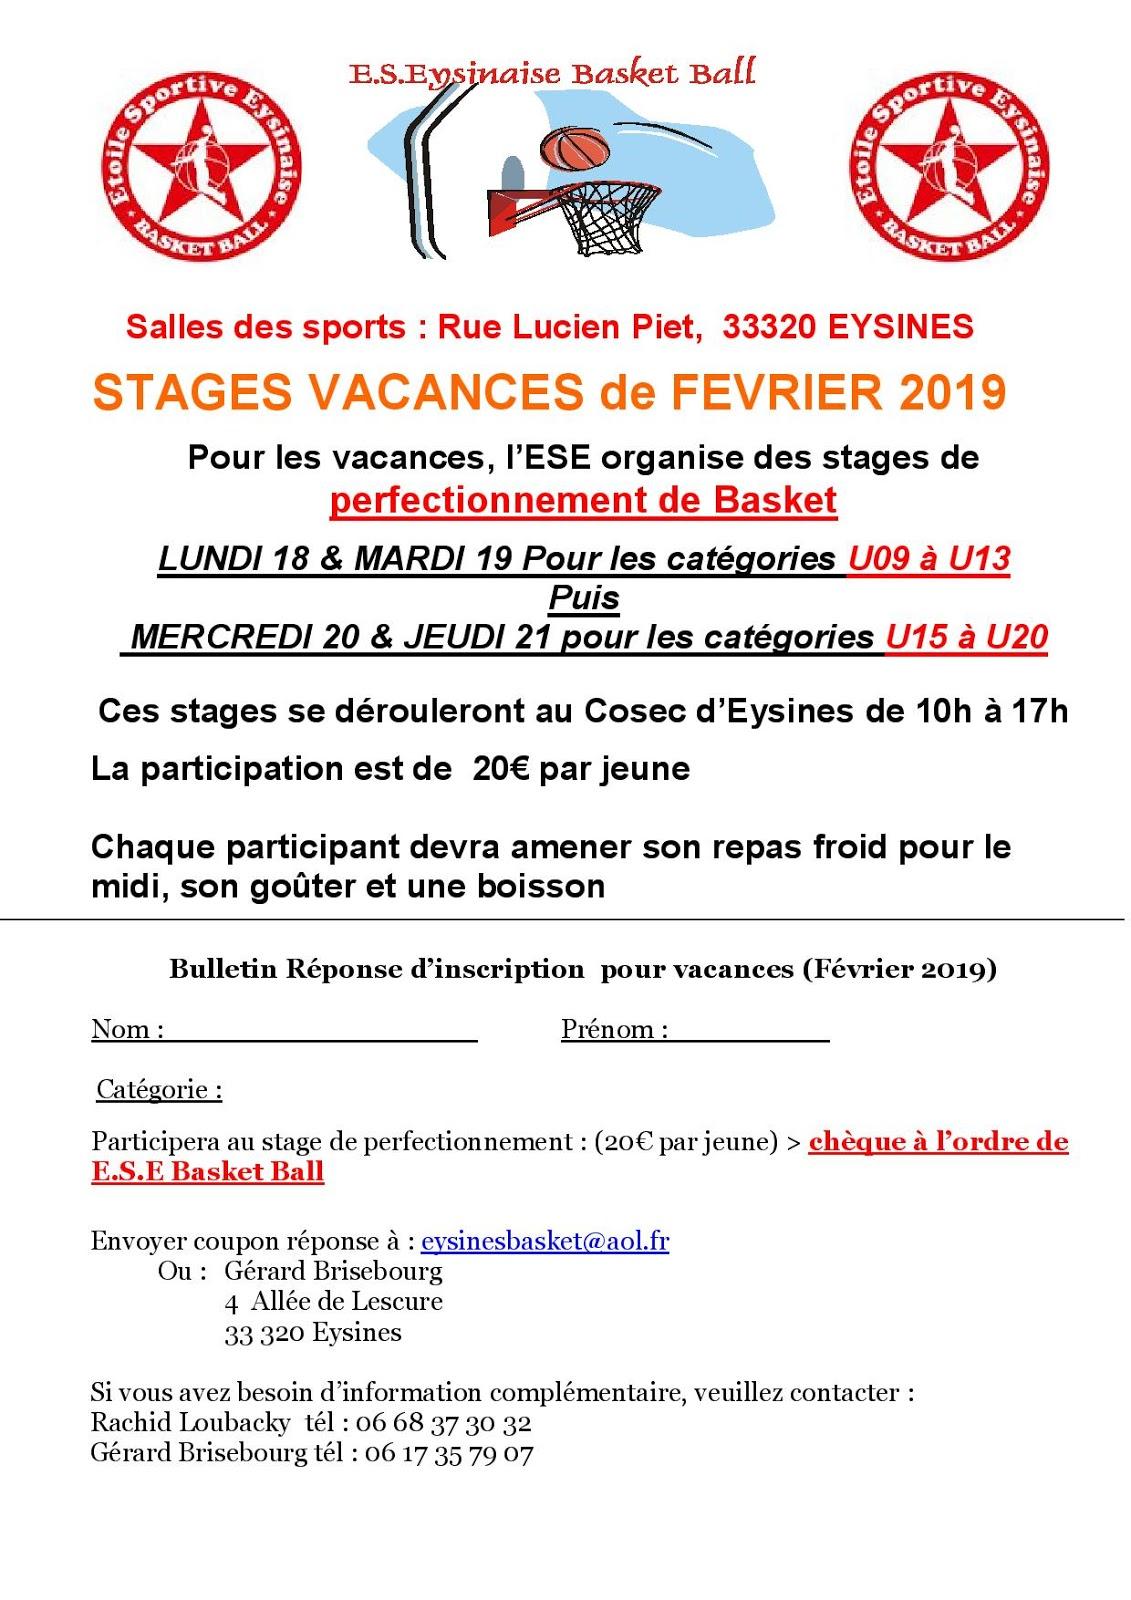 Etoile Sportive Eysinaise Basket Ball Janvier 2019